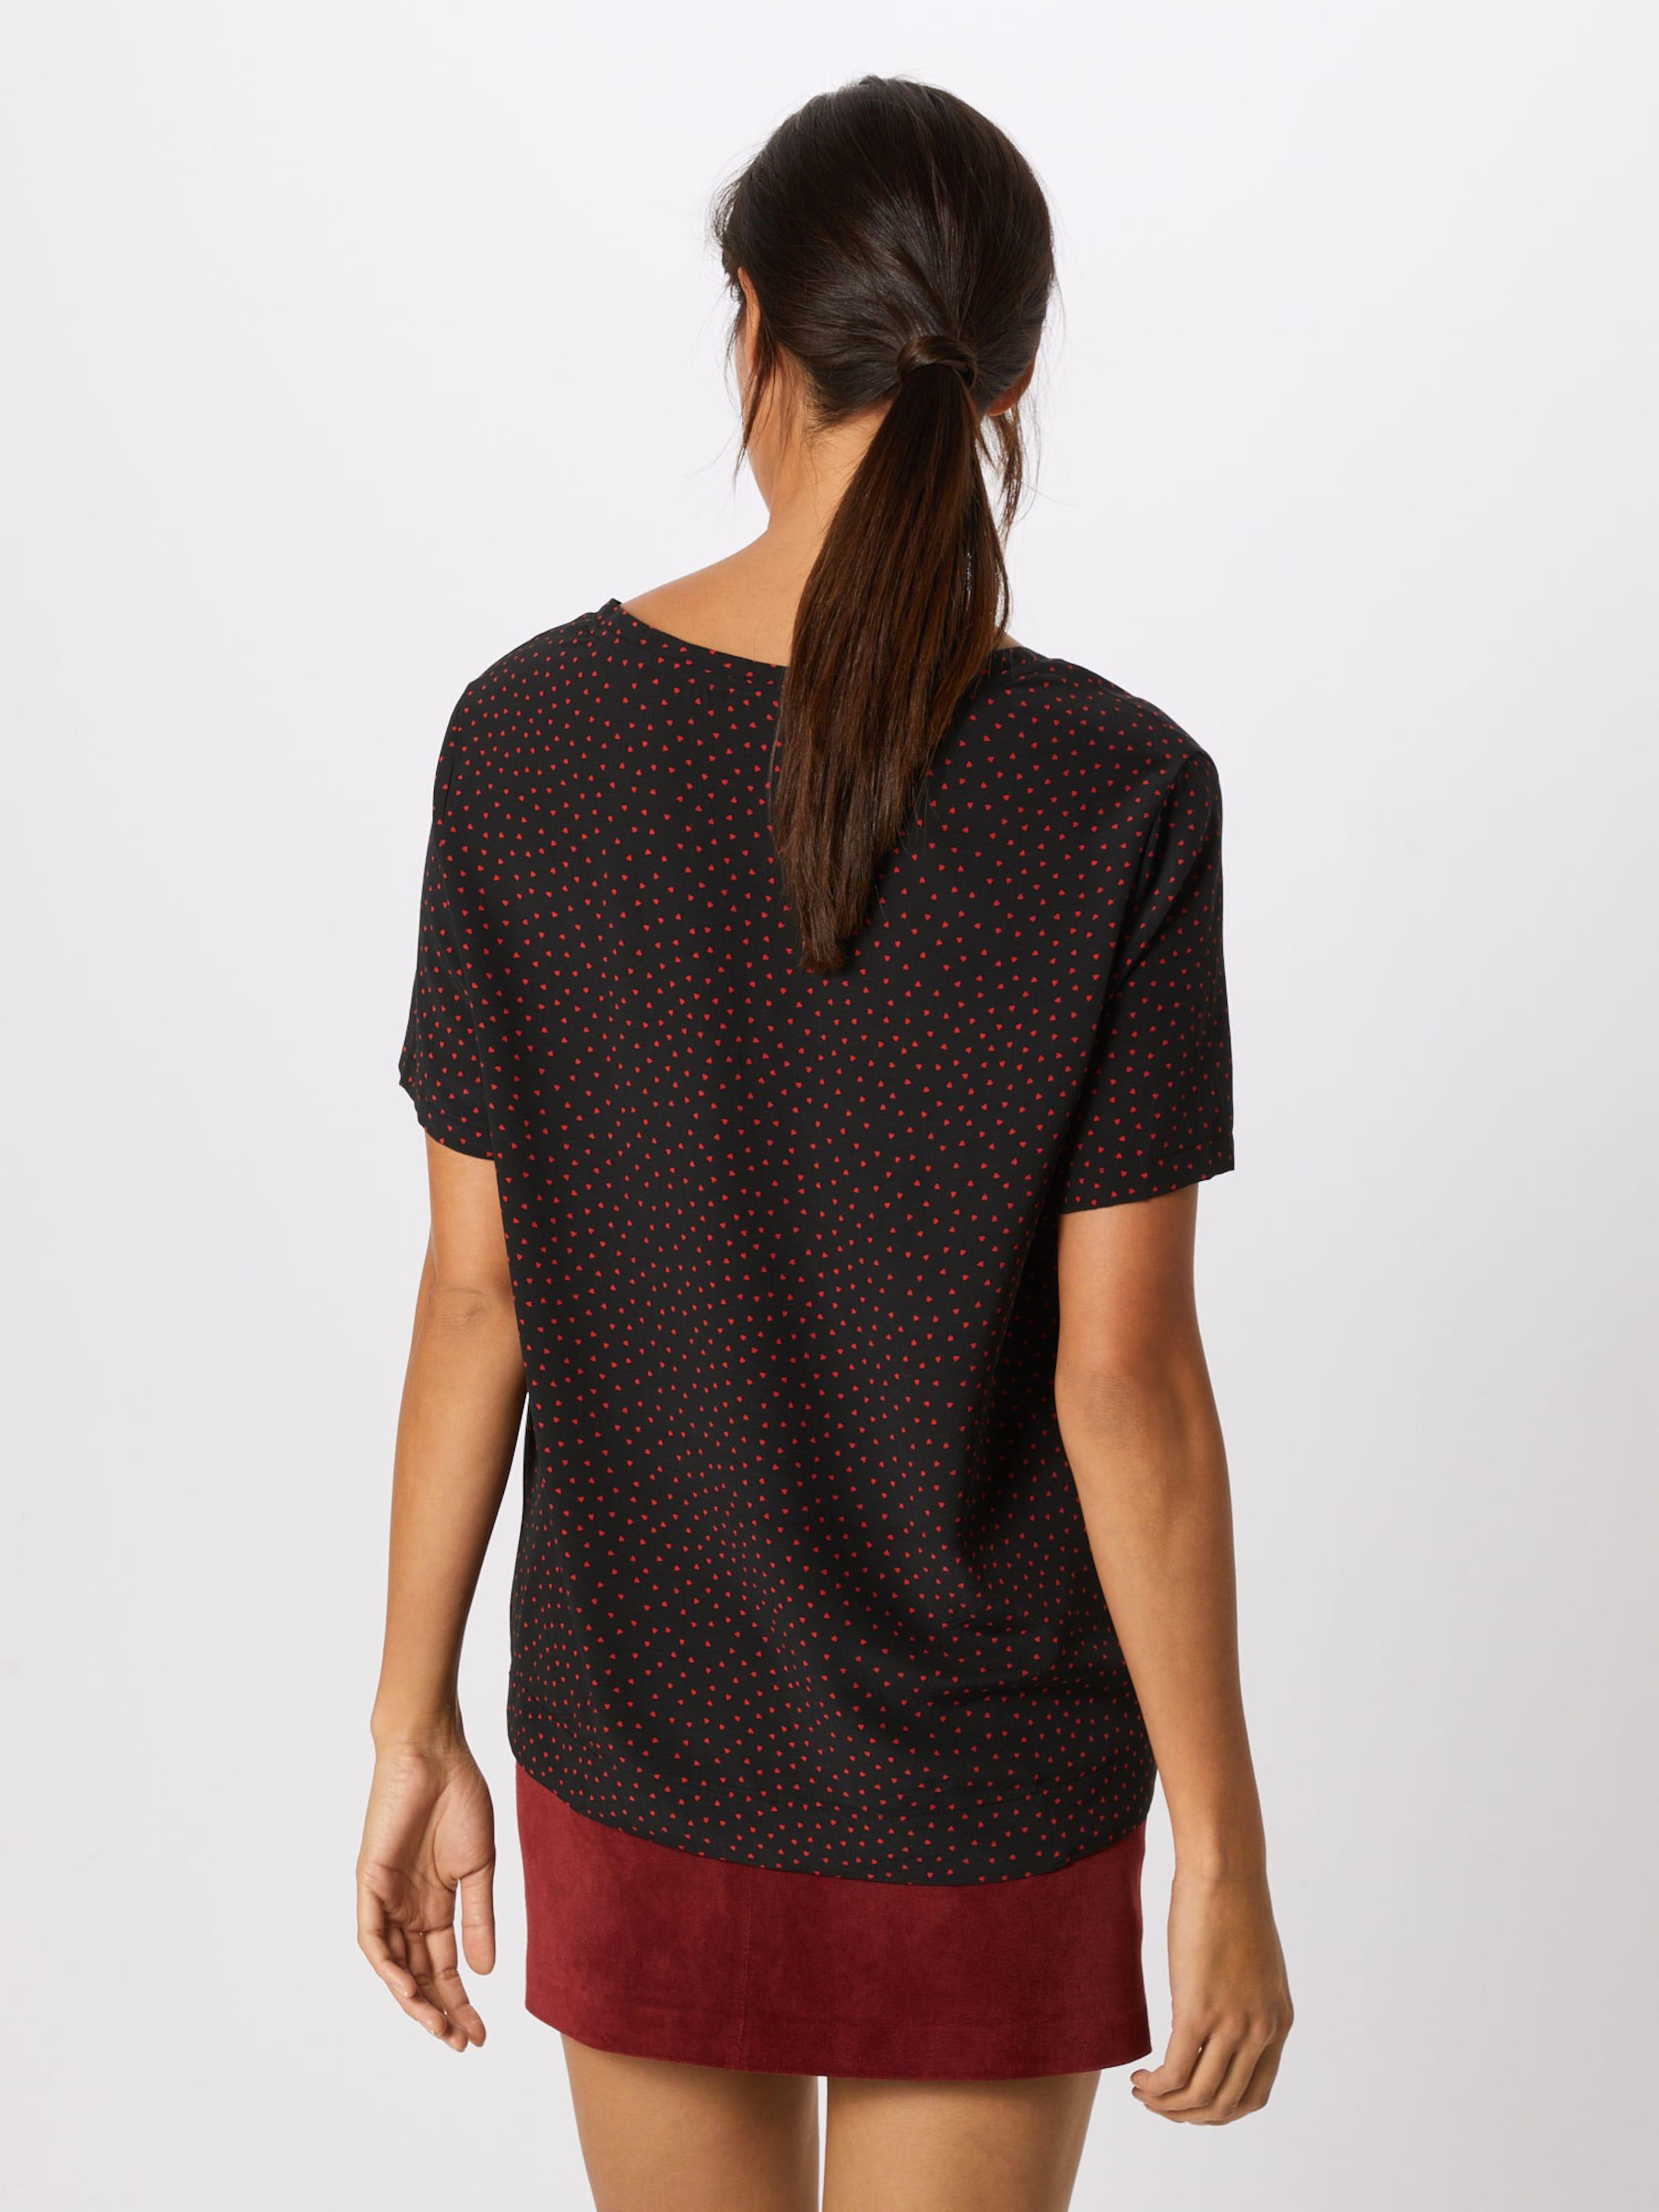 Catwalk RotSchwarz Shirts Give Love' Junkie In Me 'ts 8OkPn0w